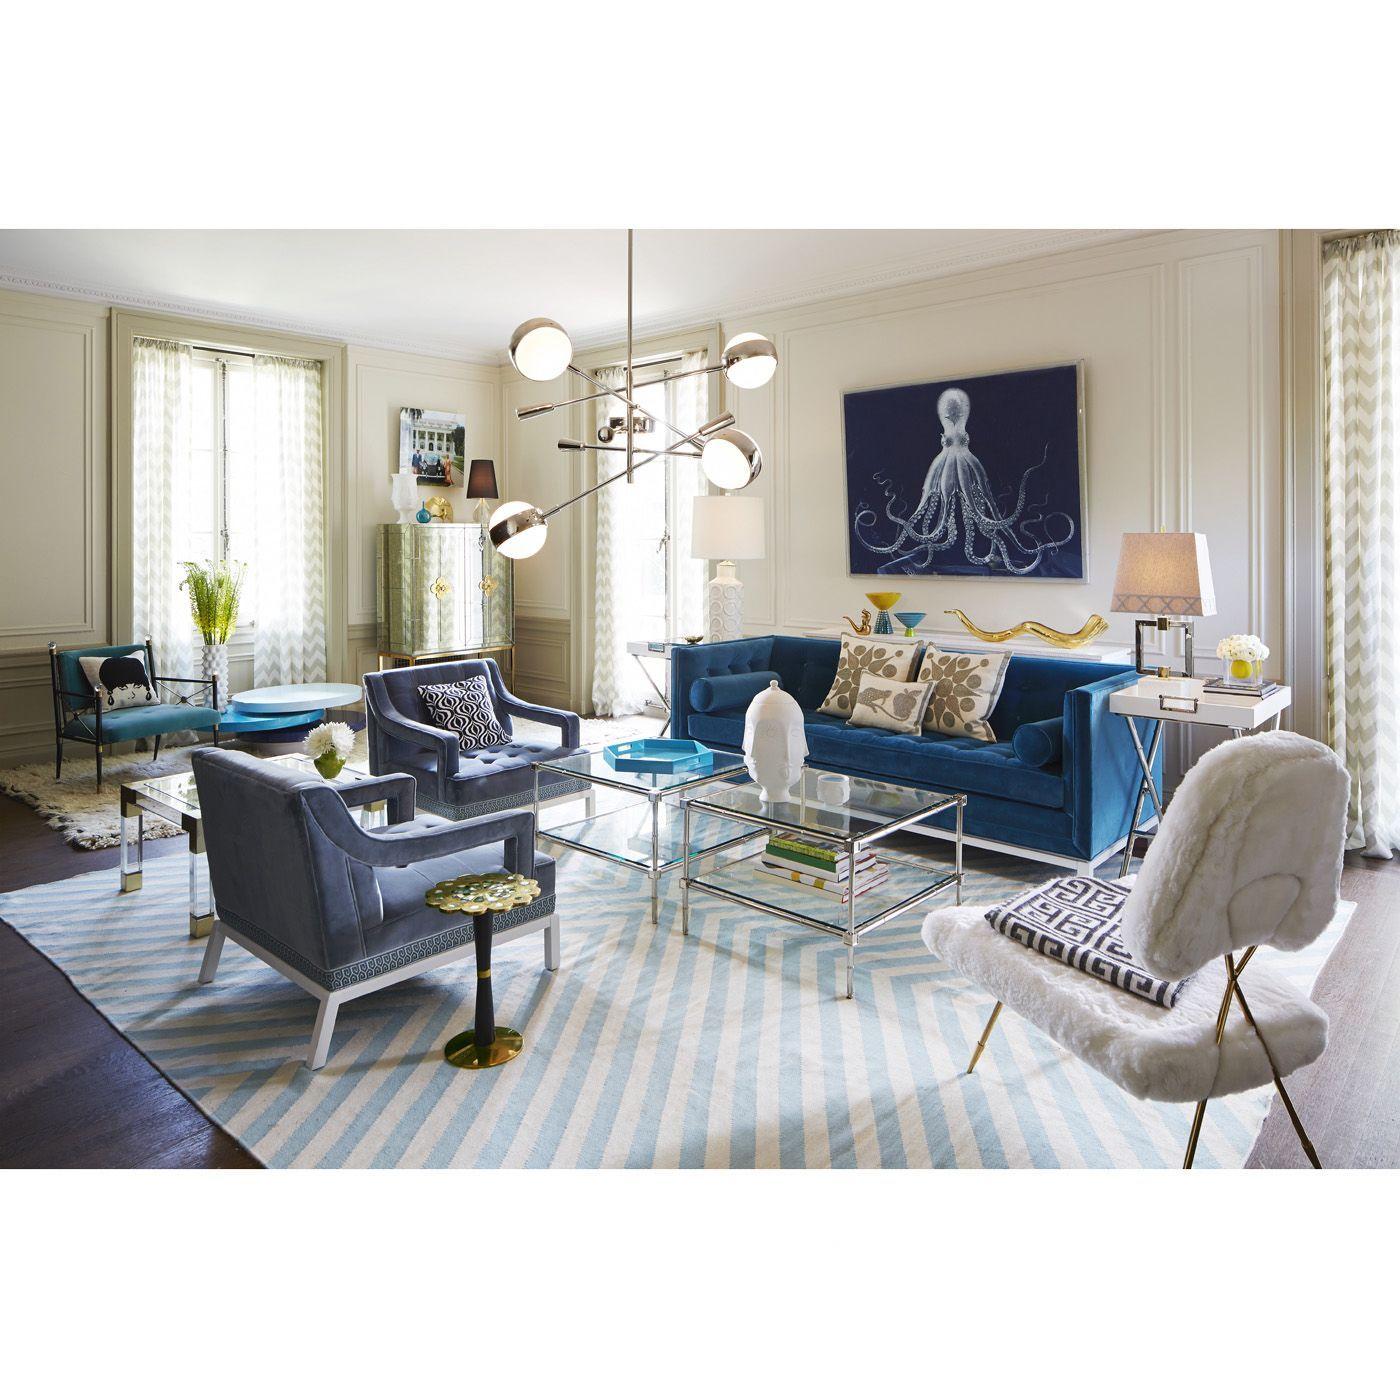 Best Eclectic Living Room Images By Wayfair Wayfair 400 x 300